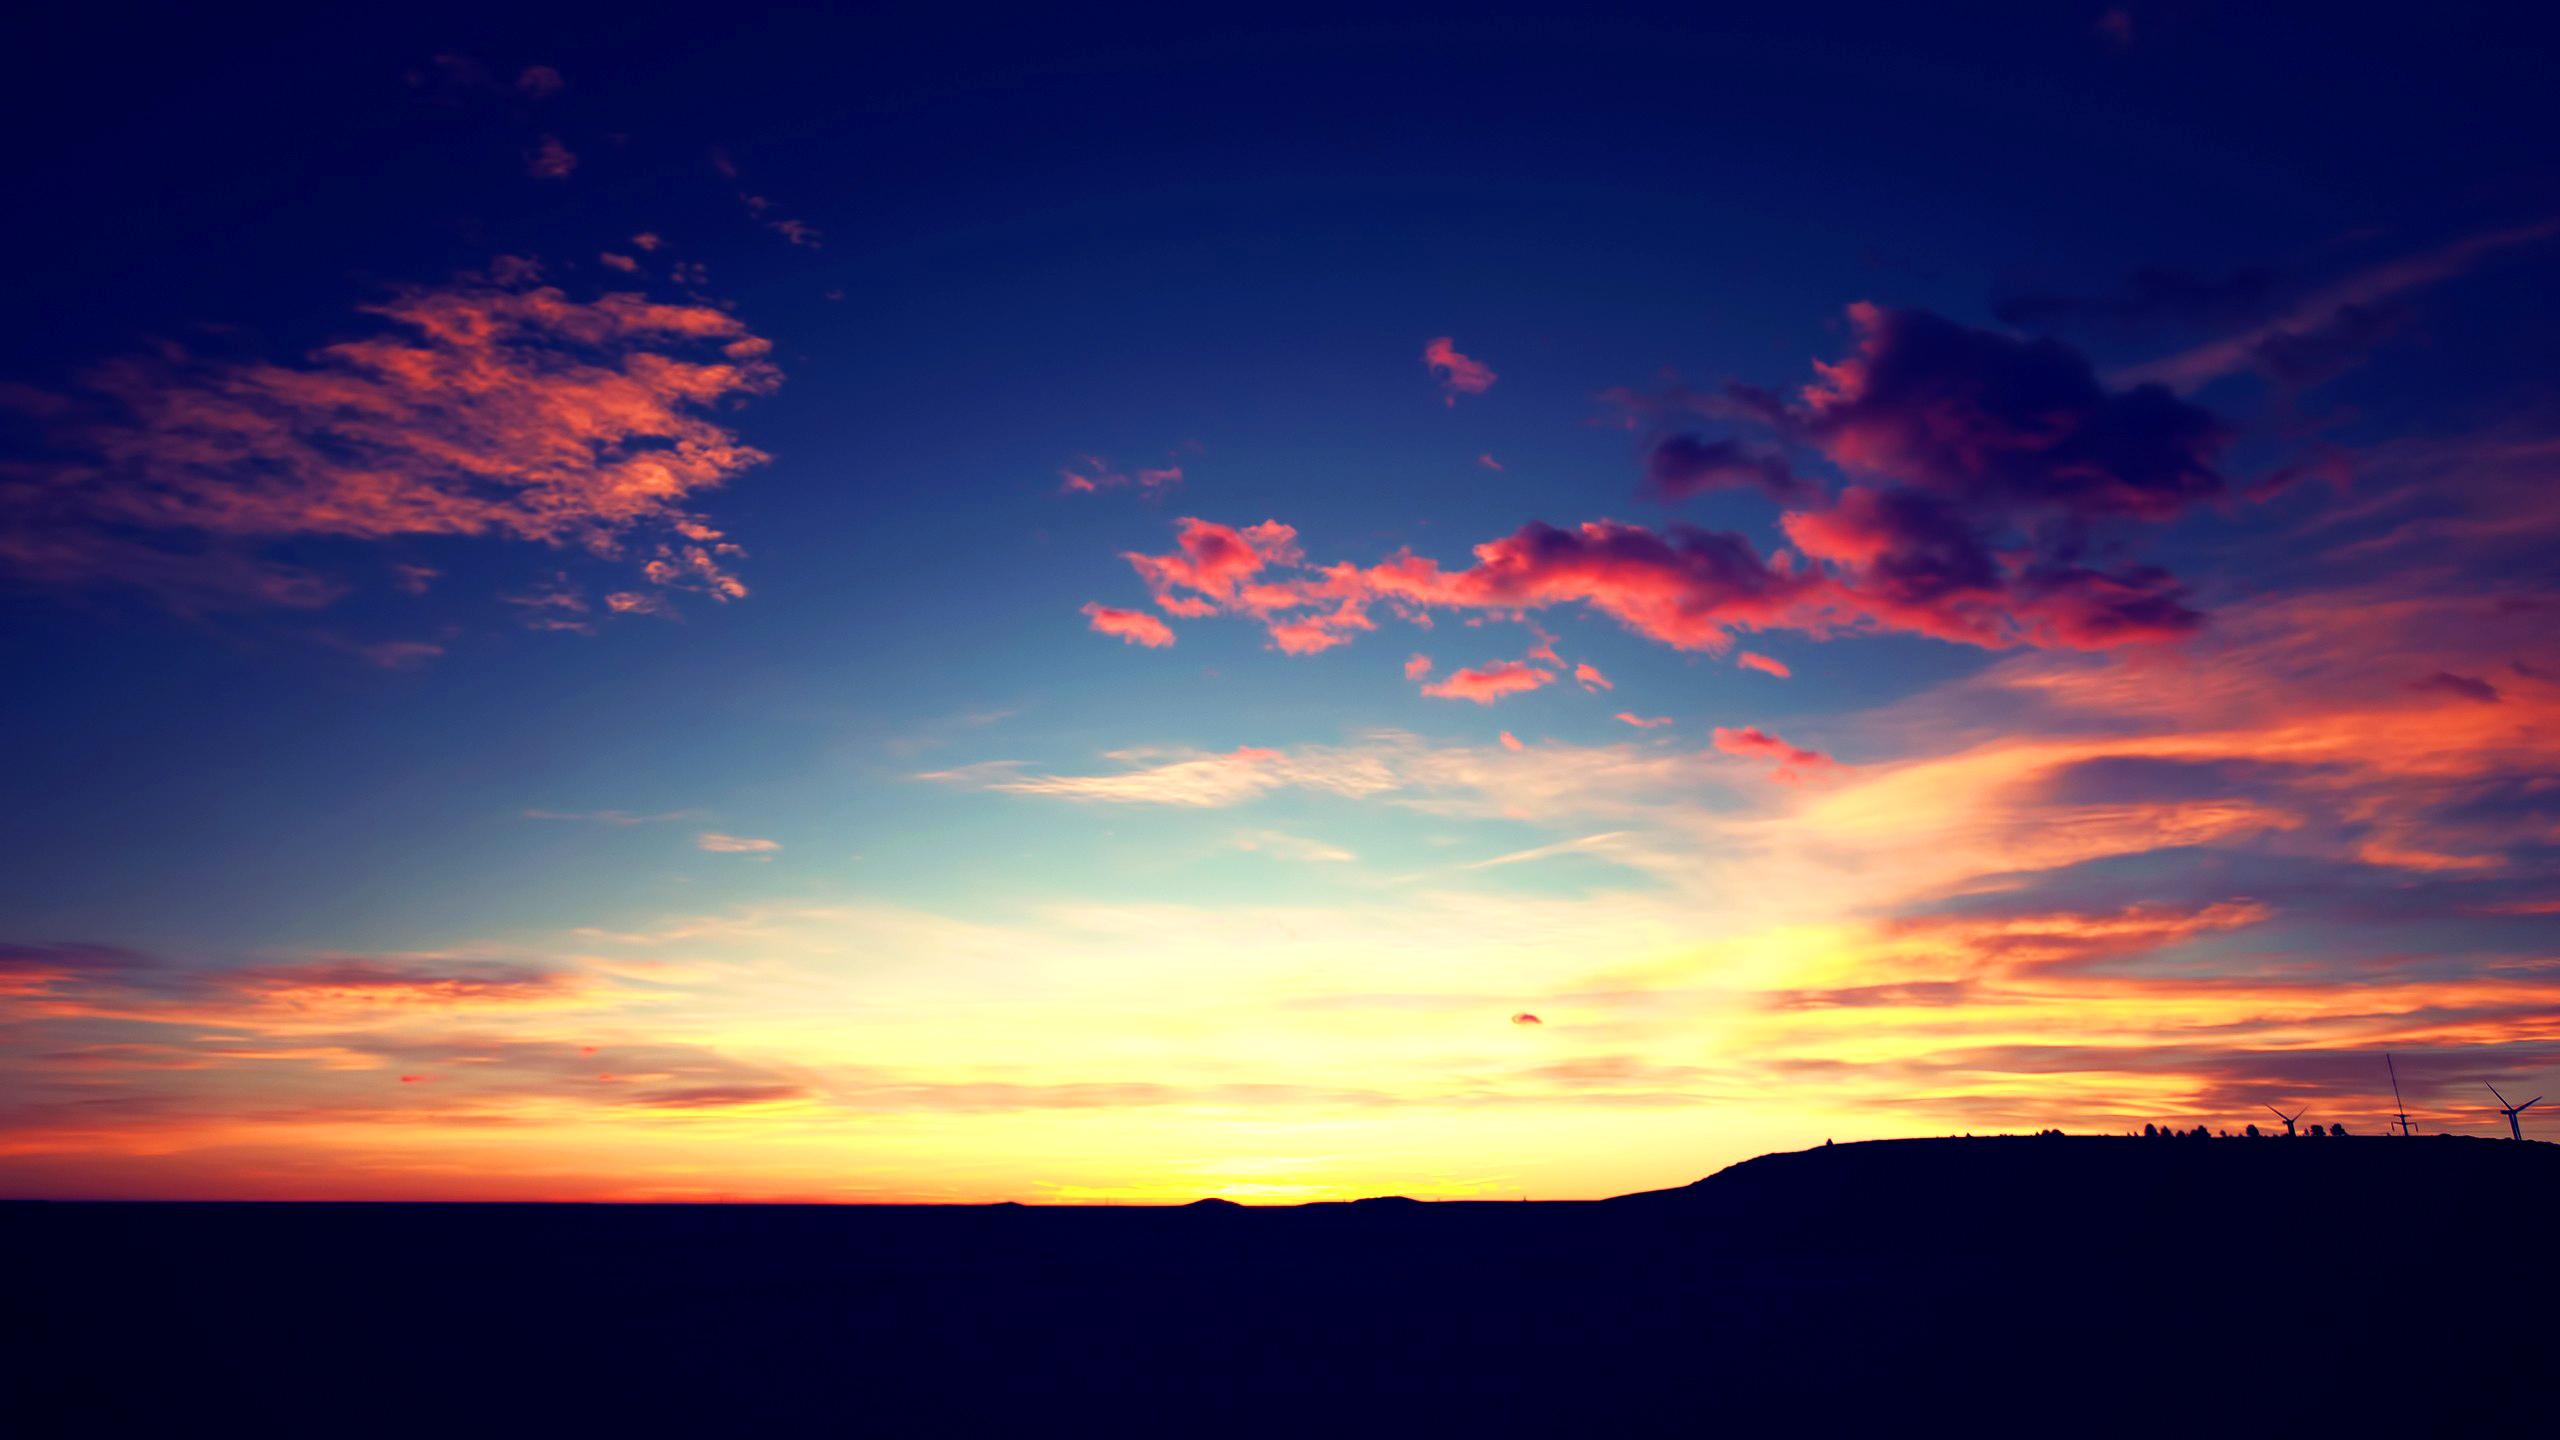 General 2560x1440 sunset clouds horizon landscape nature sunlight sky